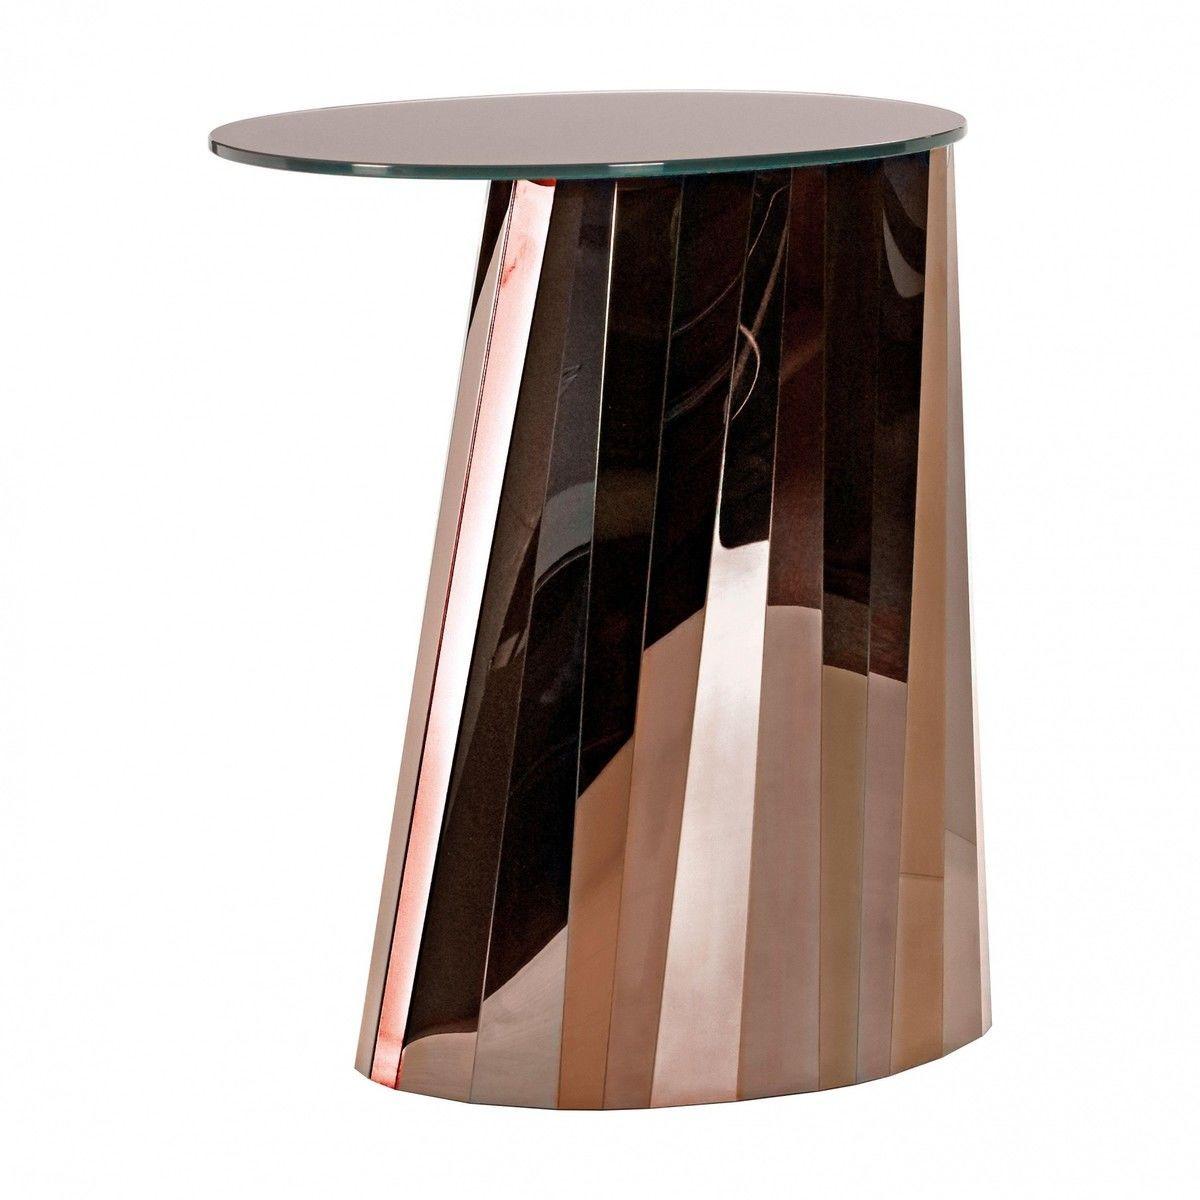 Pli side table high classicon for Beistelltisch 80 hoch